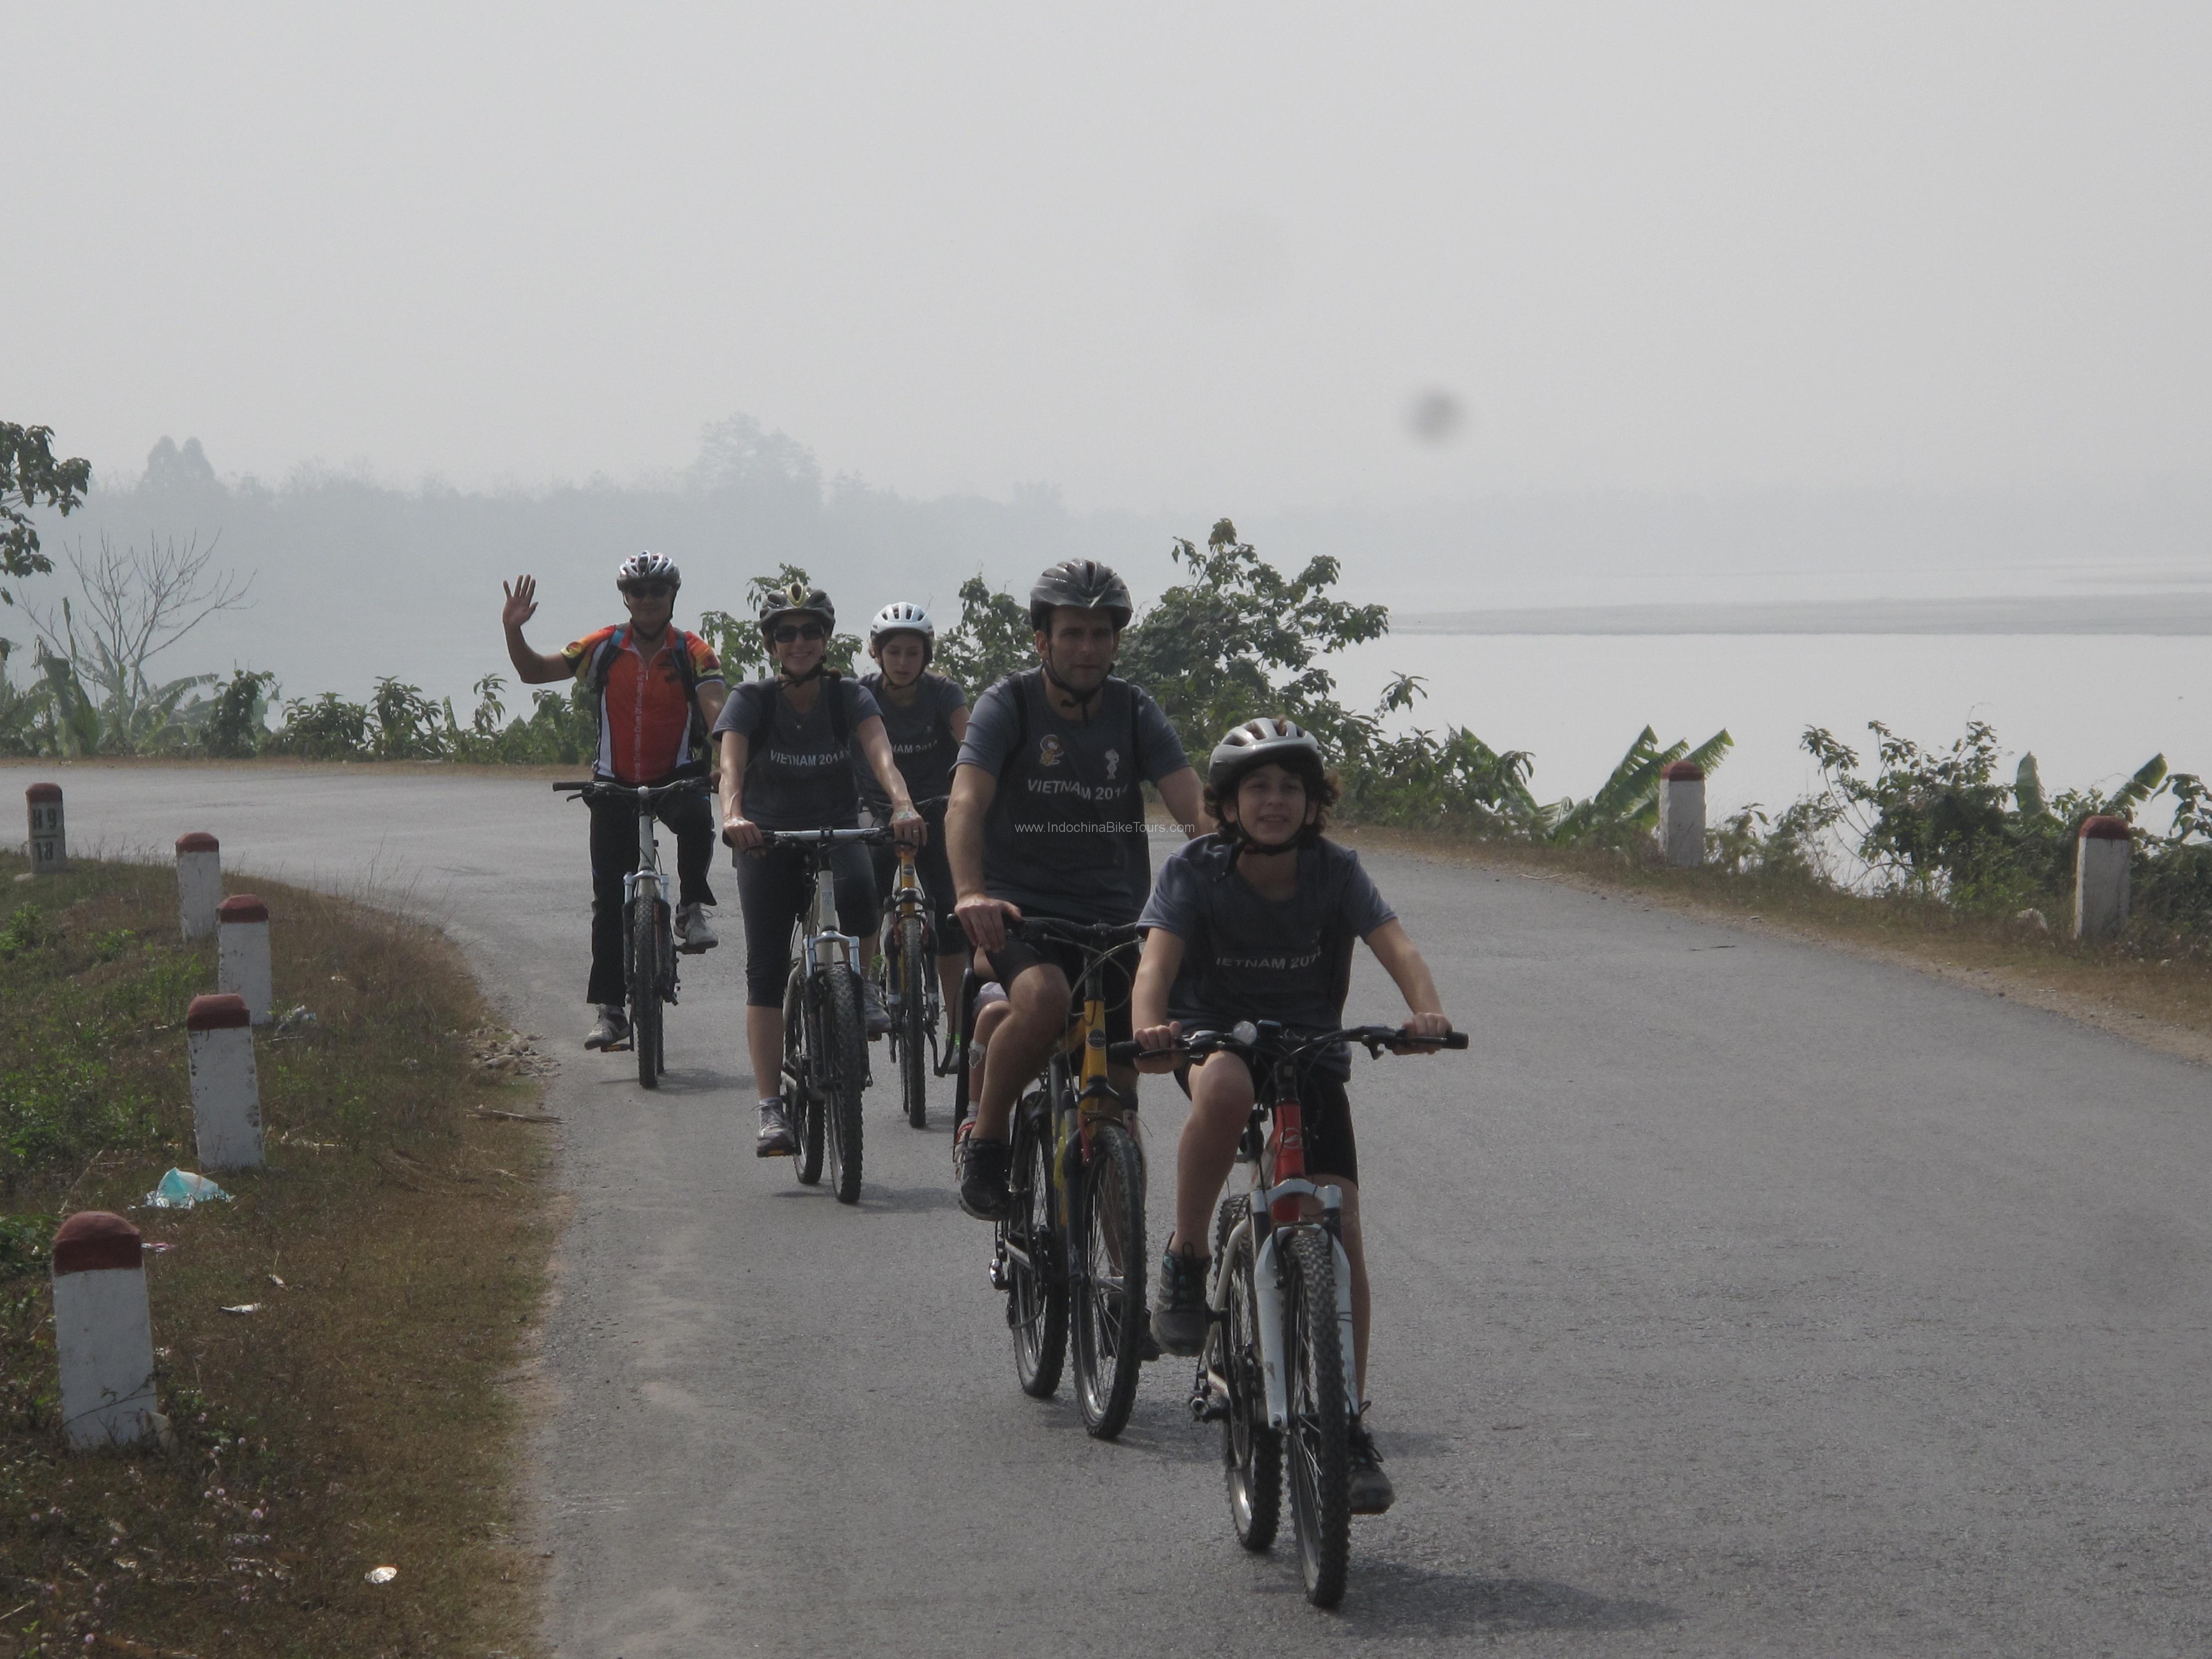 Indochina Bike Tours